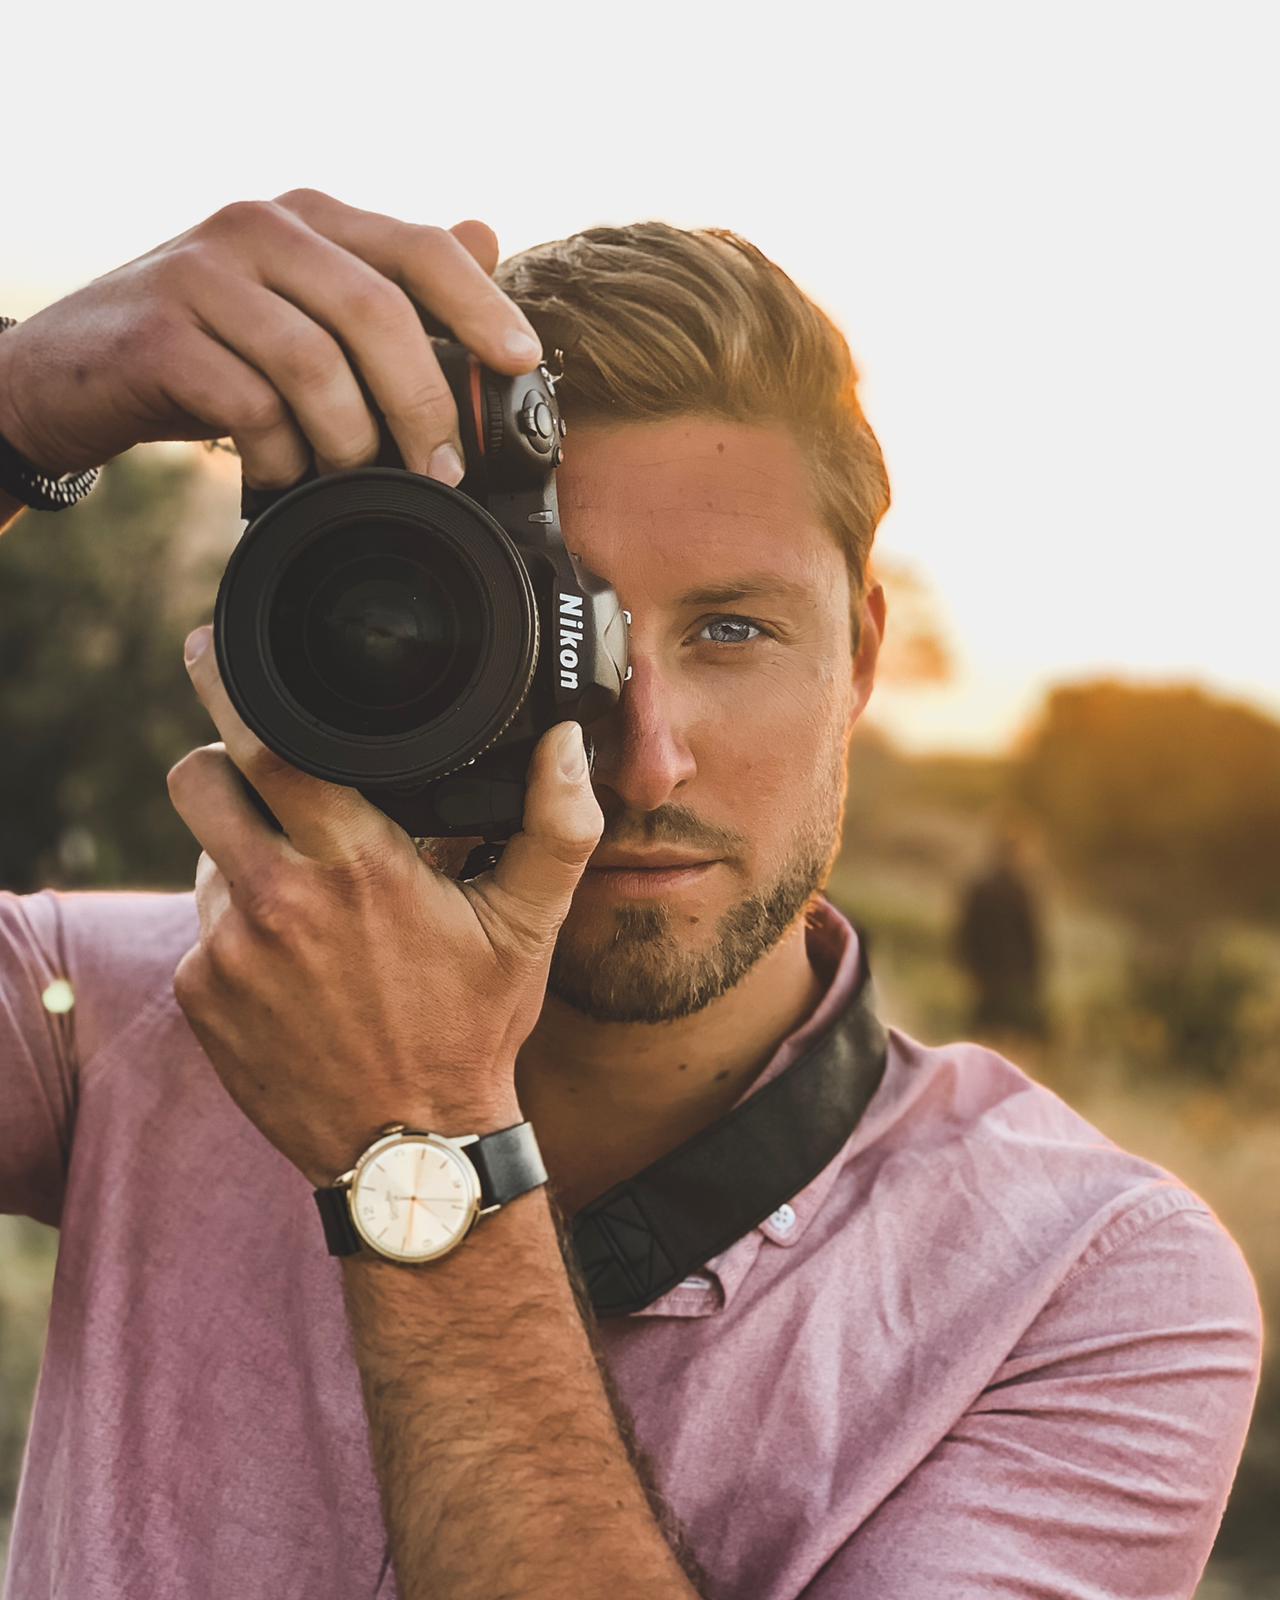 Dudefromthedam; Julian shooting with Nikon